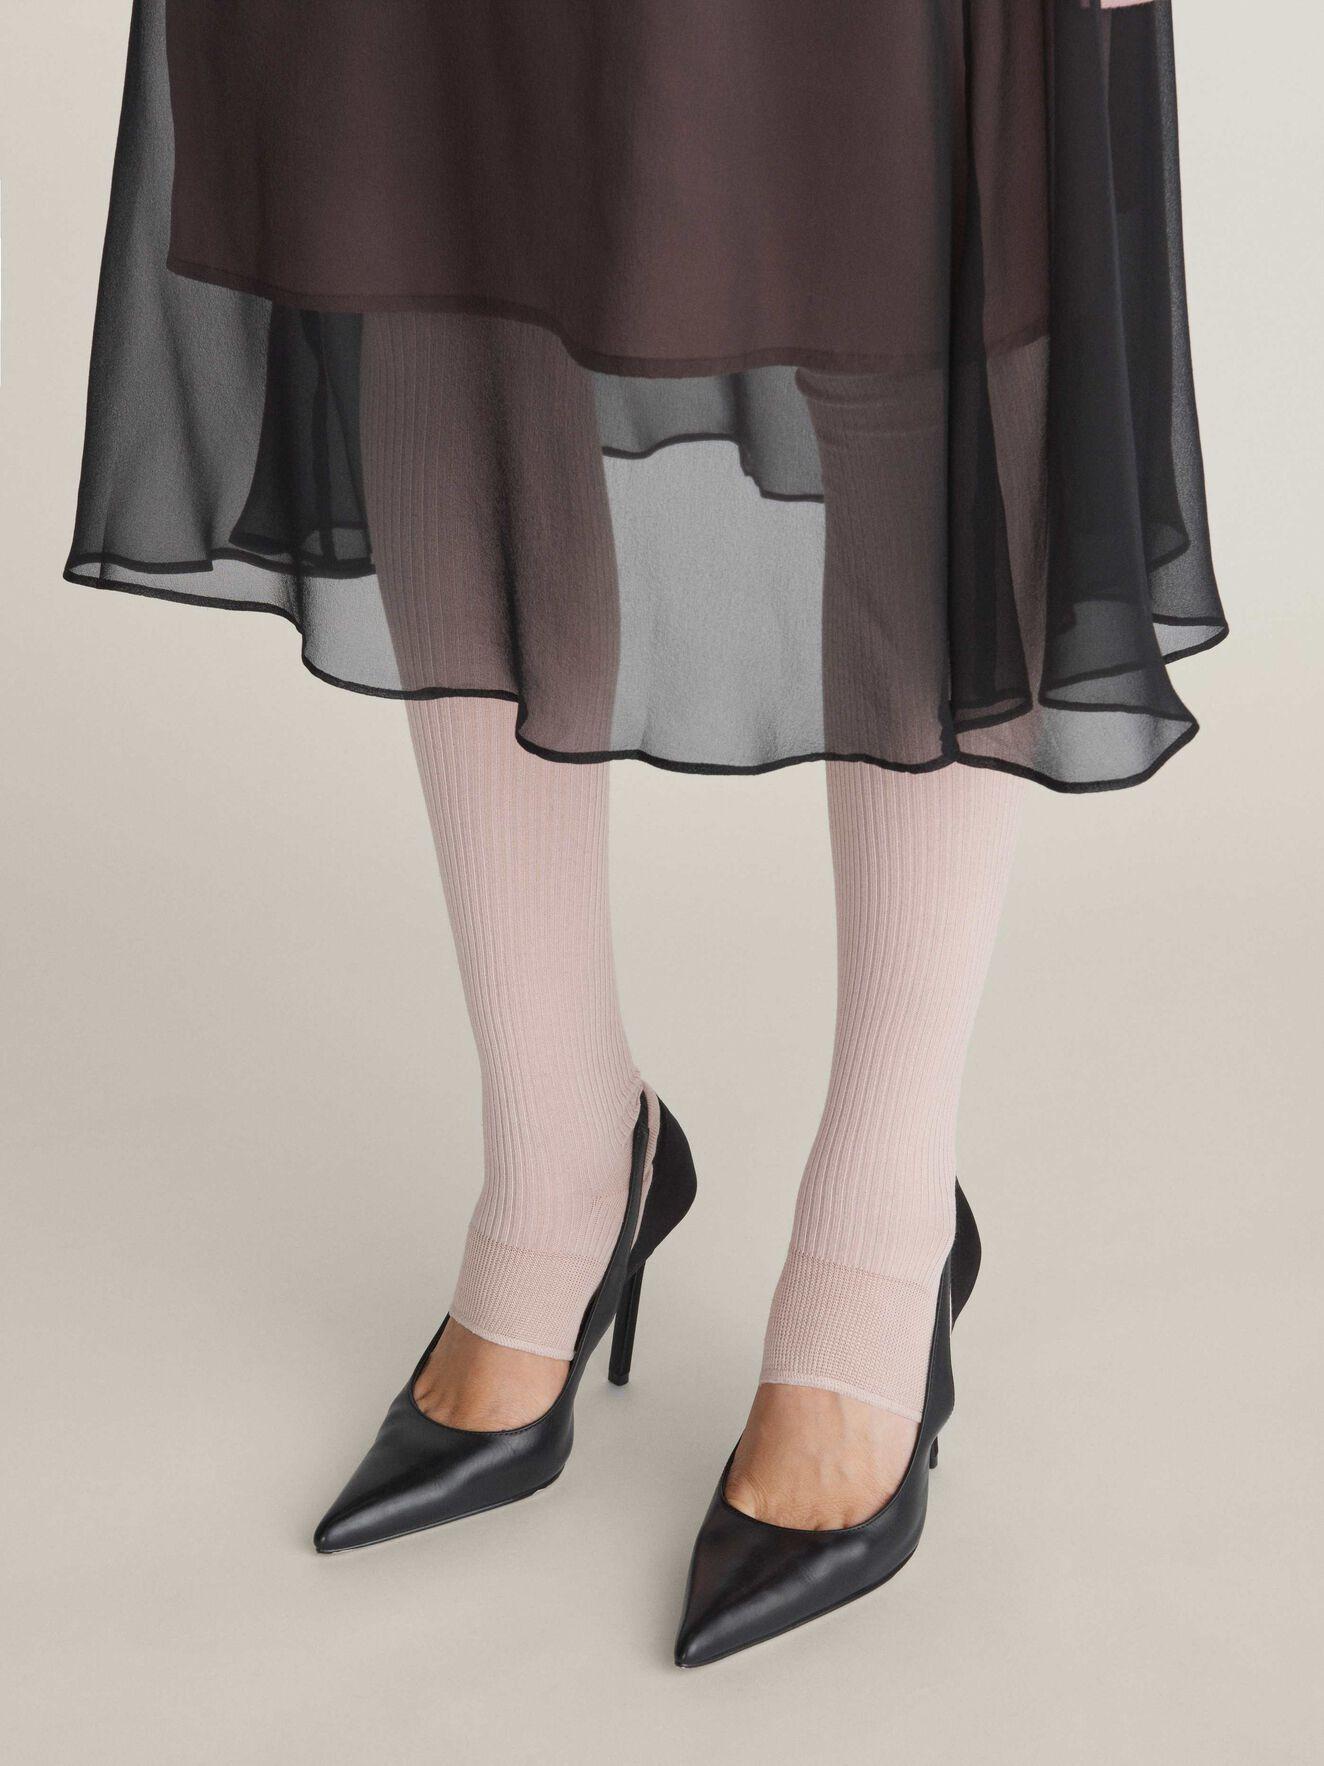 Majo Skirt in Midnight Black from Tiger of Sweden